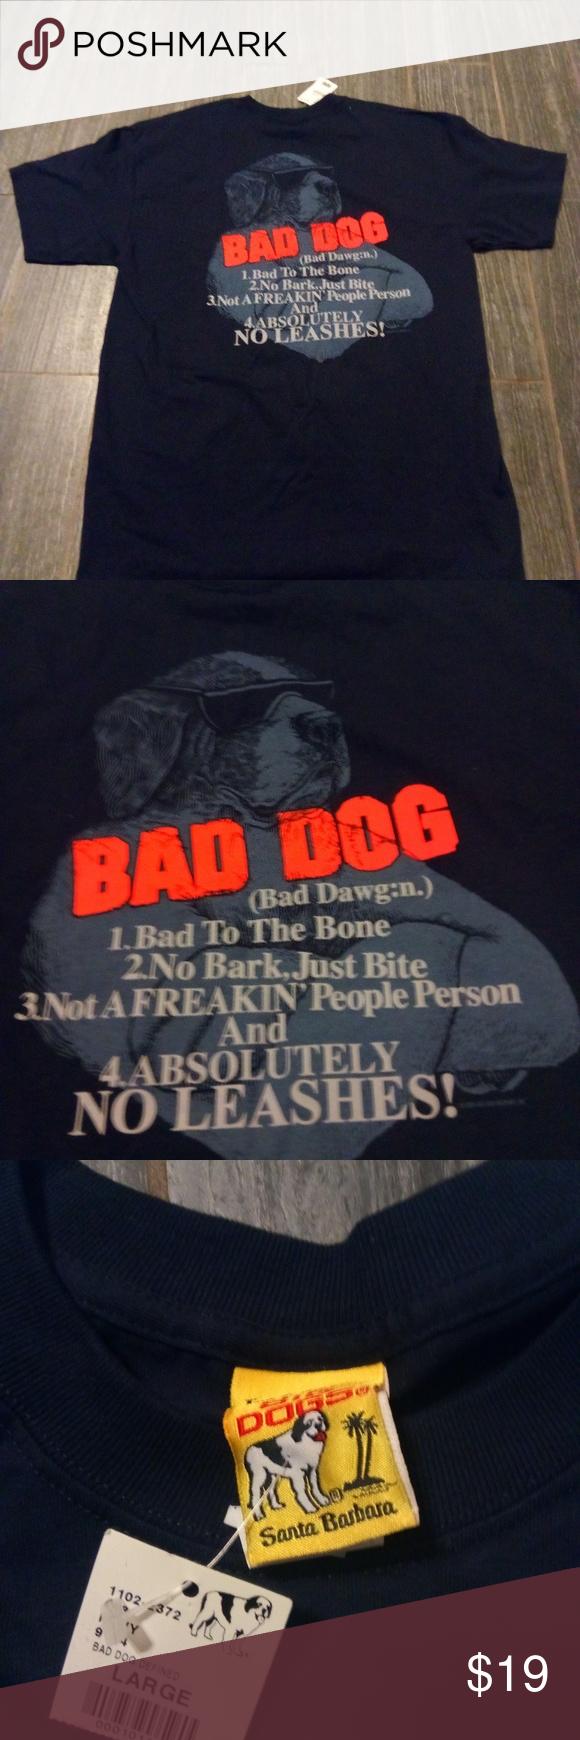 5862cc59 Bad Dog t-shirt 2005 brand new with tag size L has a loose thread at the  bottom (see pics) no stains no holes big dog Shirts Tees - Short Sleeve